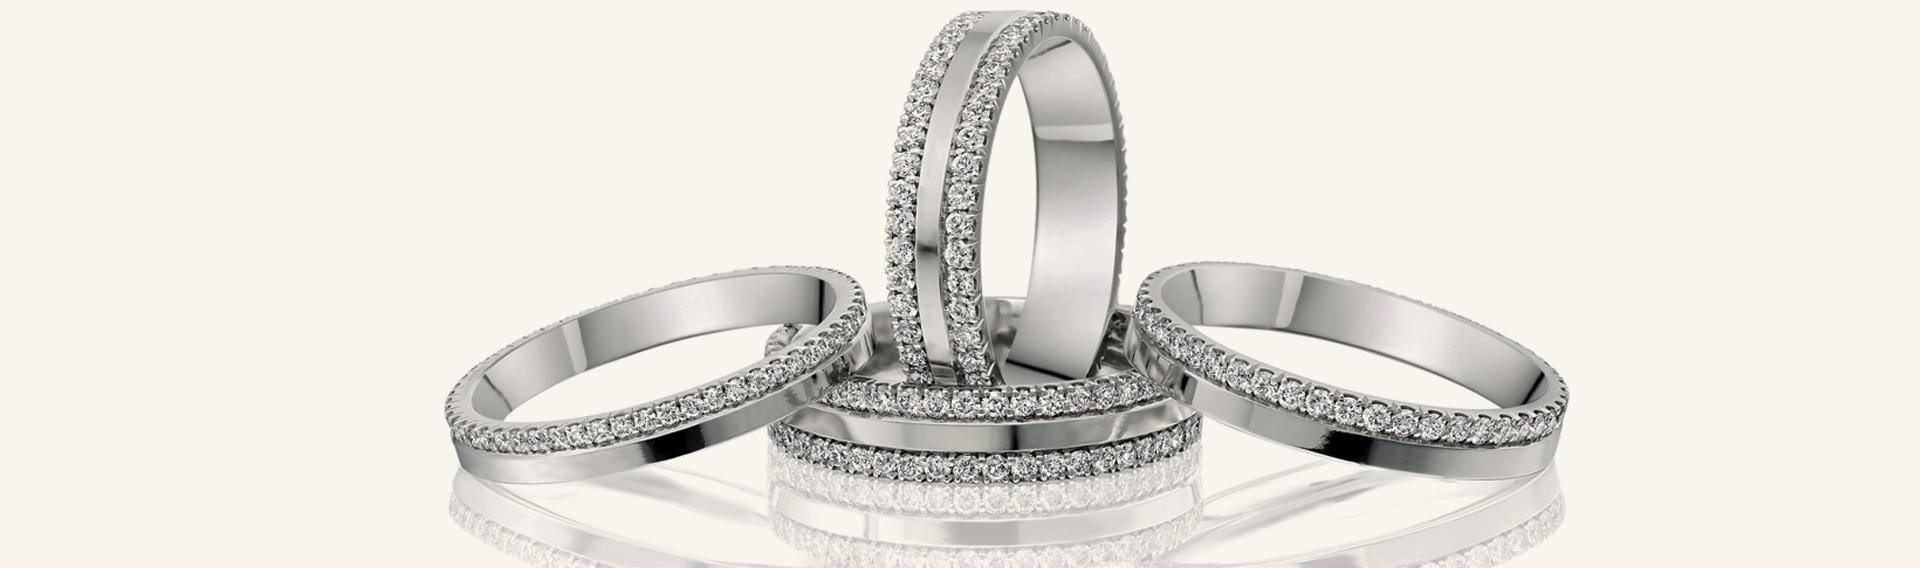 Charles Green Jewellery